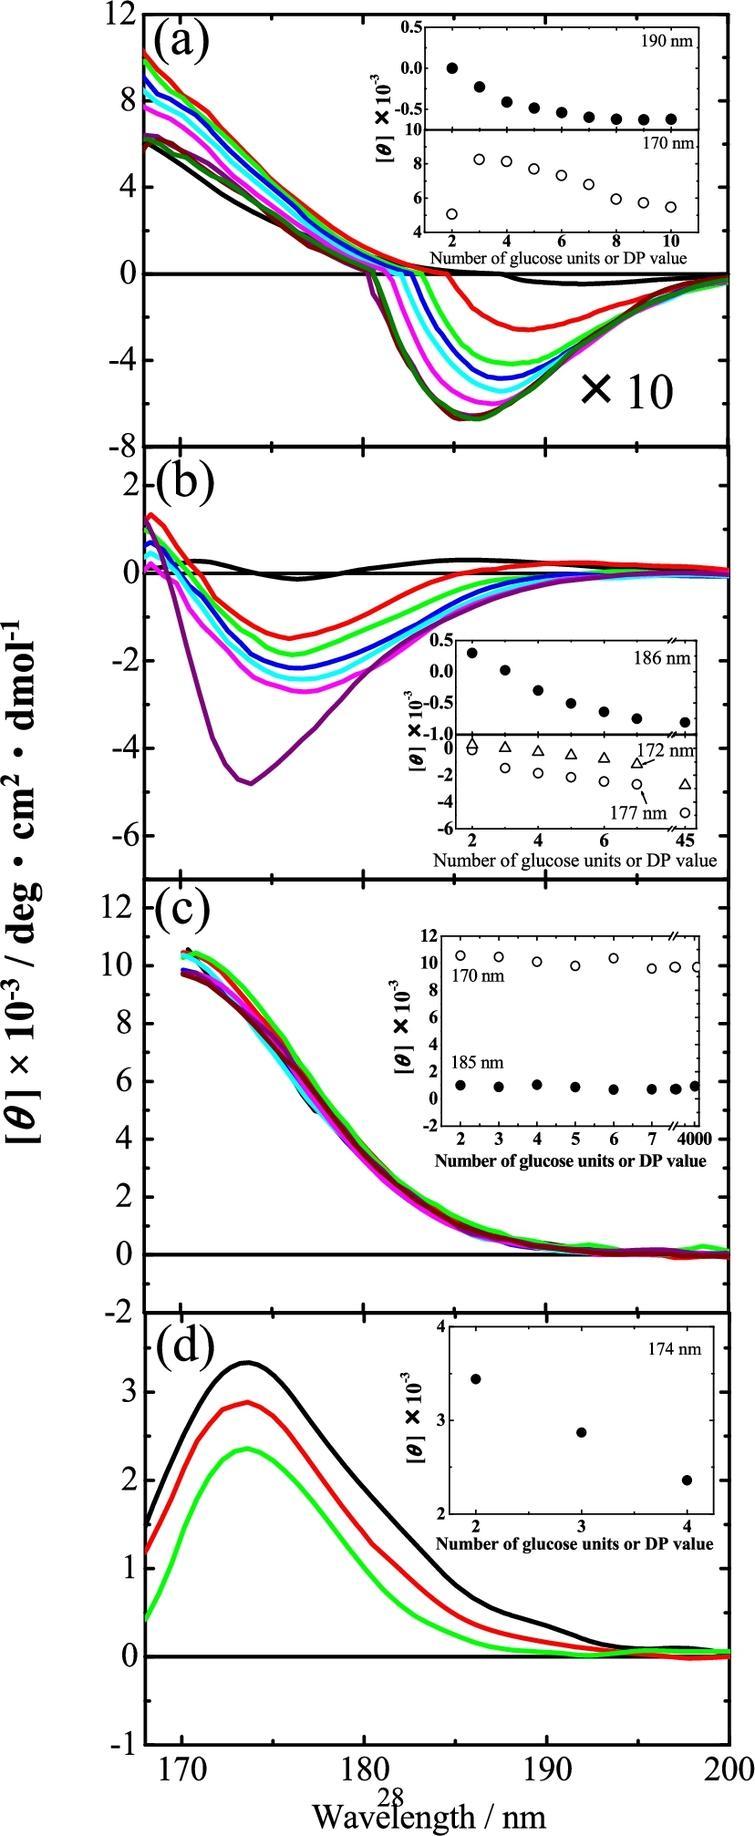 VUVCD spectra of oligosaccharides in aqueous solution at 25°C (a) malto-oligosaccharide series (maltose, black; maltotriose, red; maltotetraose, green; maltopentaose, blue; maltohexaose, sky blue; maltoheptaose, pink; maltooctaose, violet; maltononaose, brown; and maltodecaose, dark green). The intensities of CD in the negative region were shown in the 10-fold spectra. (b) laminari-oligosaccharide series (laminaribiose, black; laminaritriose, red; laminaritetraose, green; laminaripentaose, blue; laminarihexaose, sky blue; and laminariheptaose, pink) and laminarin (violet). (c) isomalto-oligosaccharide series (isomaltose, black; isomaltotriose, red; isomaltotetraose, green; isomaltopentaose, blue; isomaltohexaose, sky blue; and isomaltoheptaose, pink) and dextran (DP≈31, violet; and DP≈4,000, brown). (d) cello-oligosaccharide series (cellobiose, black; cellotriose, red; and cellotetraose, green).